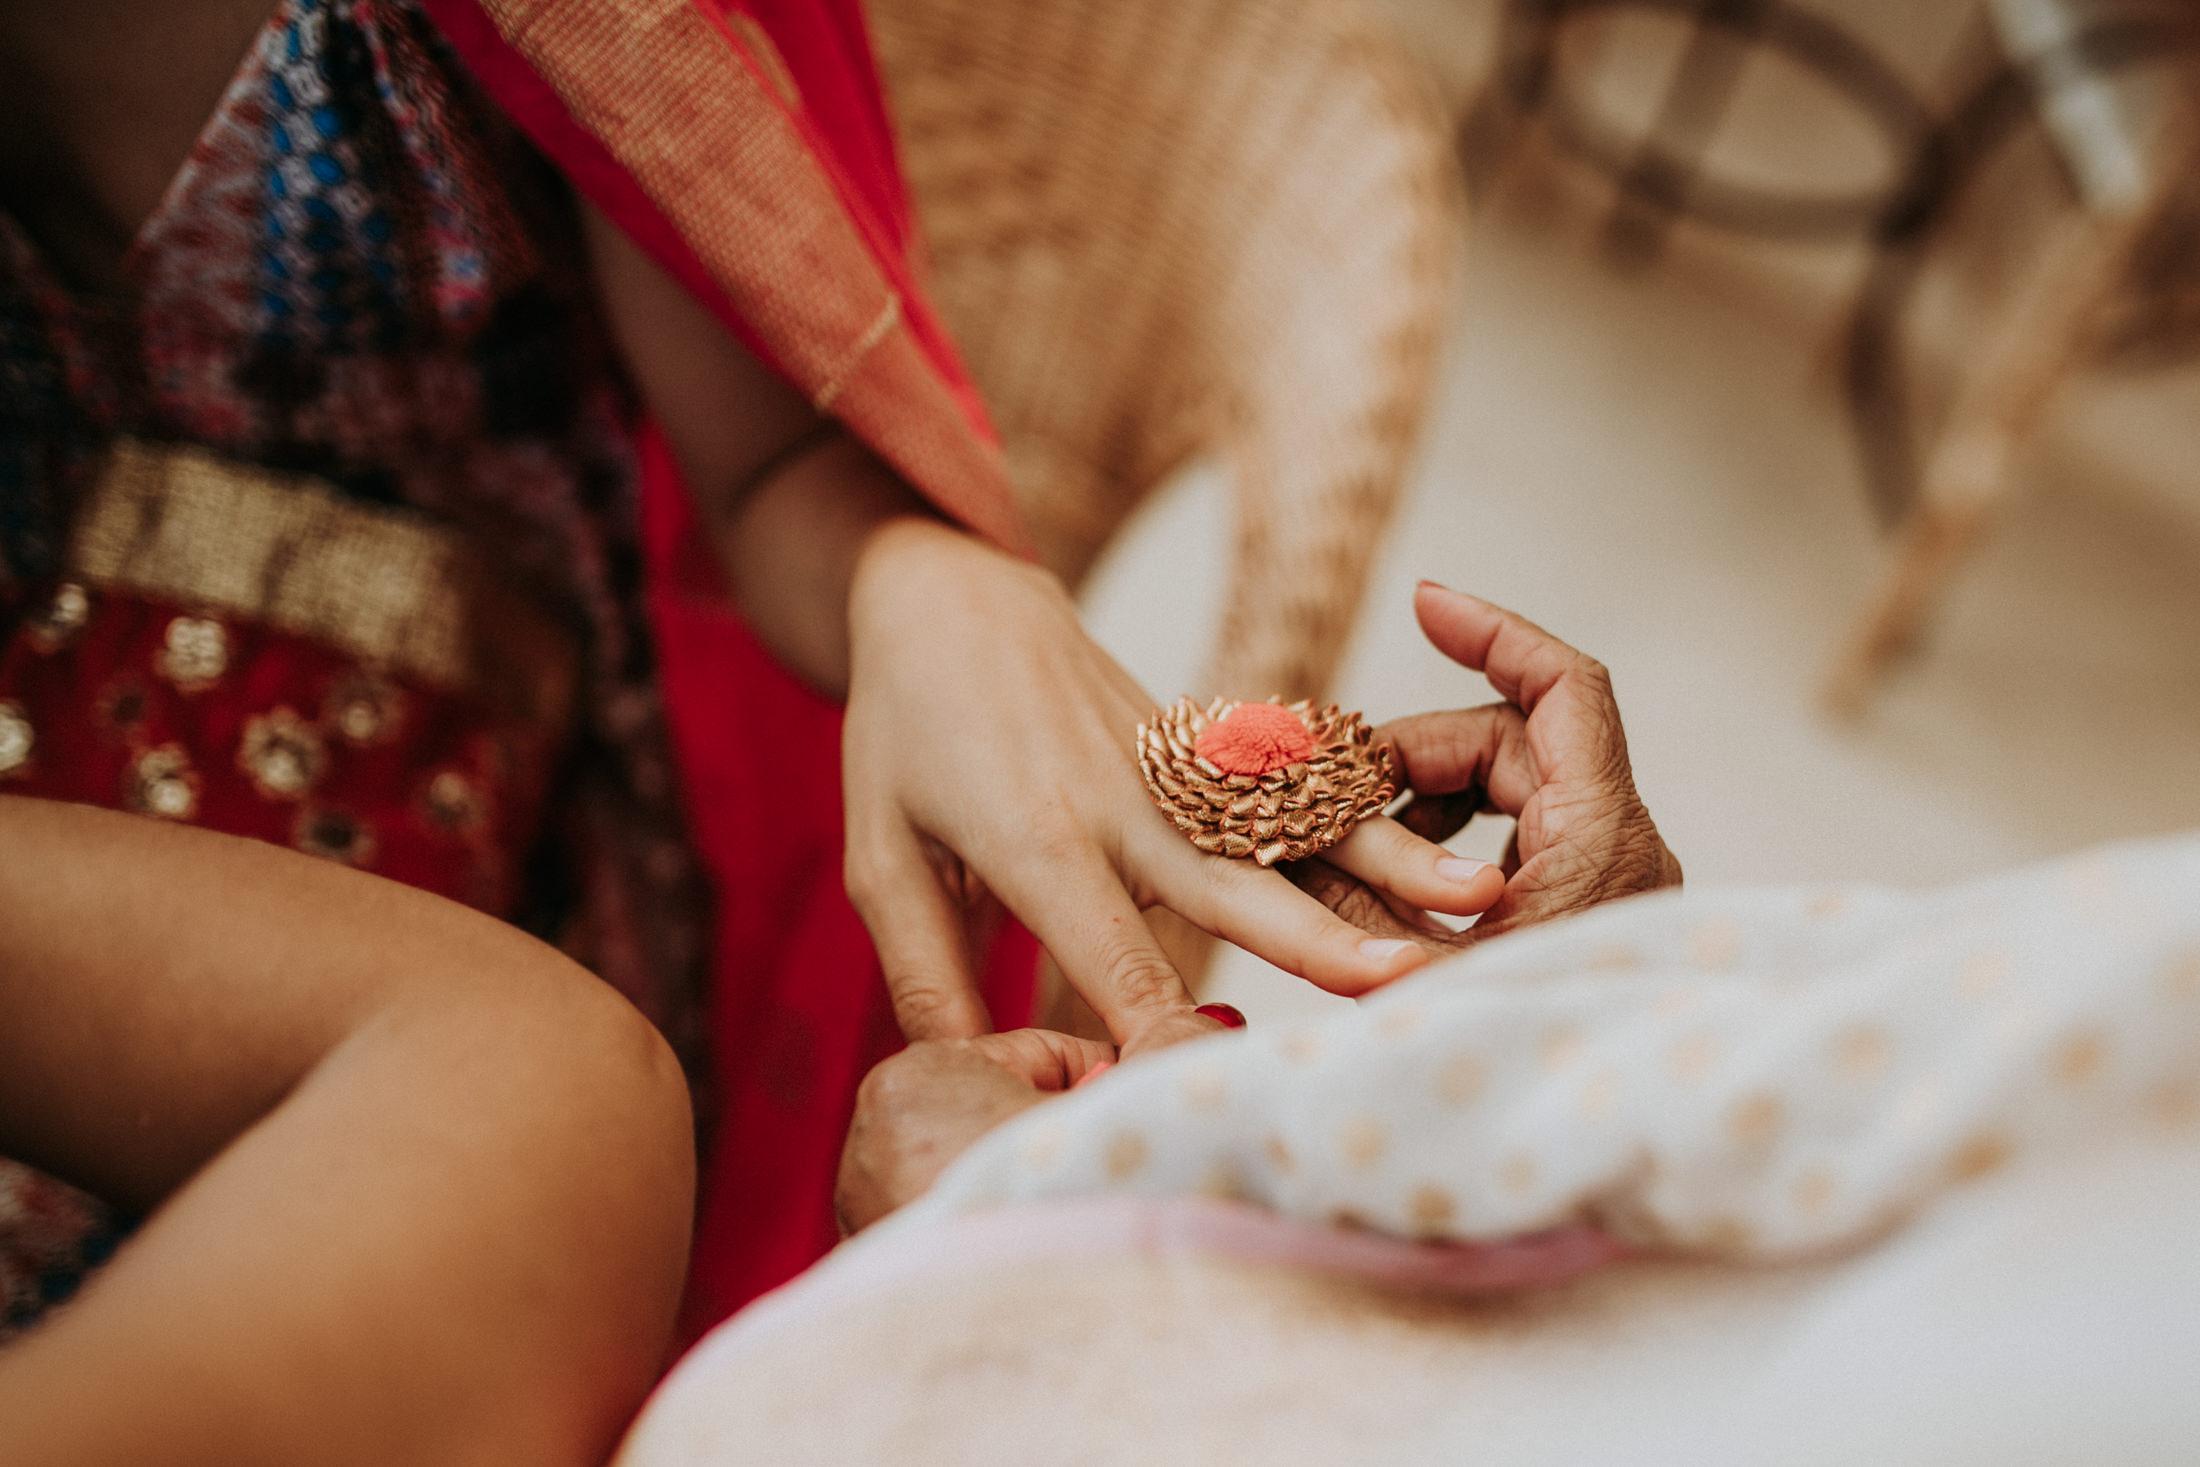 Wedding_Photographer_Mallorca_Daniela-Marquardt_Photography_New_York_Iceland_Tuscany_Santorini_Portugal_Austria_Bavaria_Elopement_Hochzeitsfotograf_AntjeRajat1_19